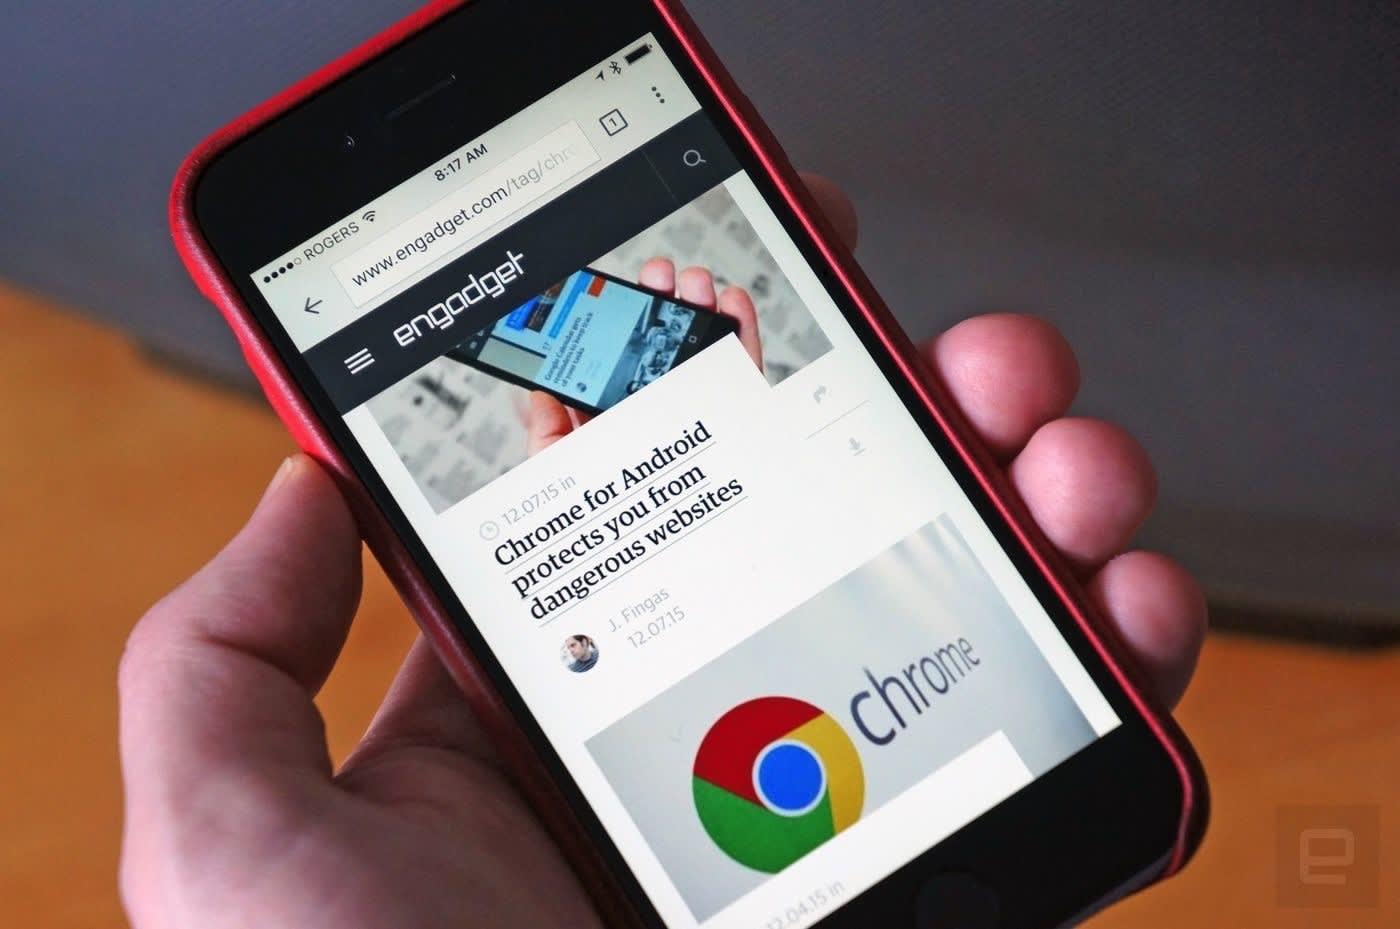 Android Chrome Dark mode